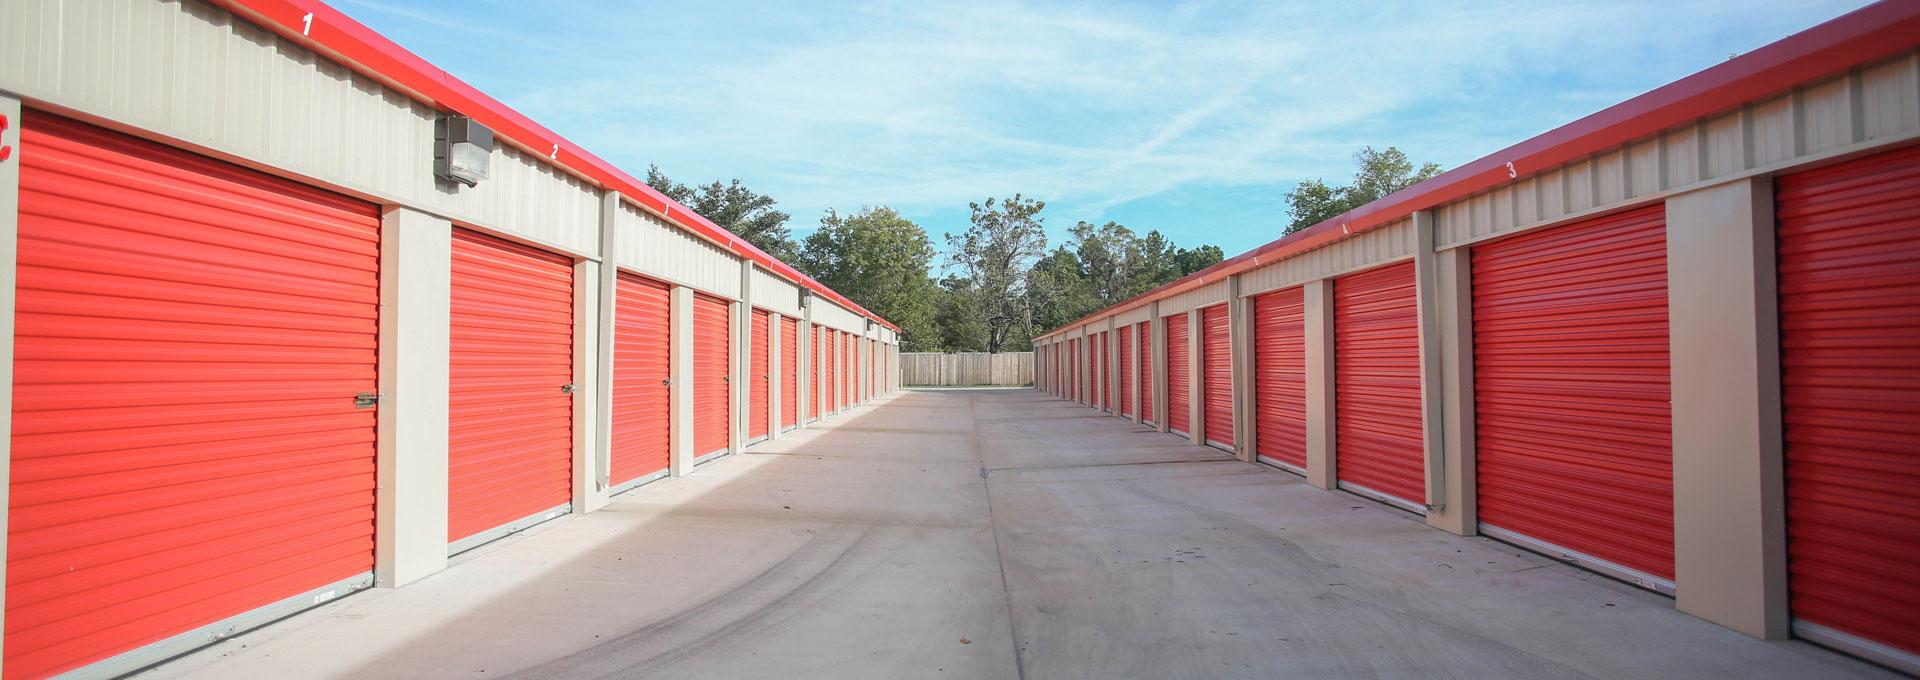 storage units outdoor standard units